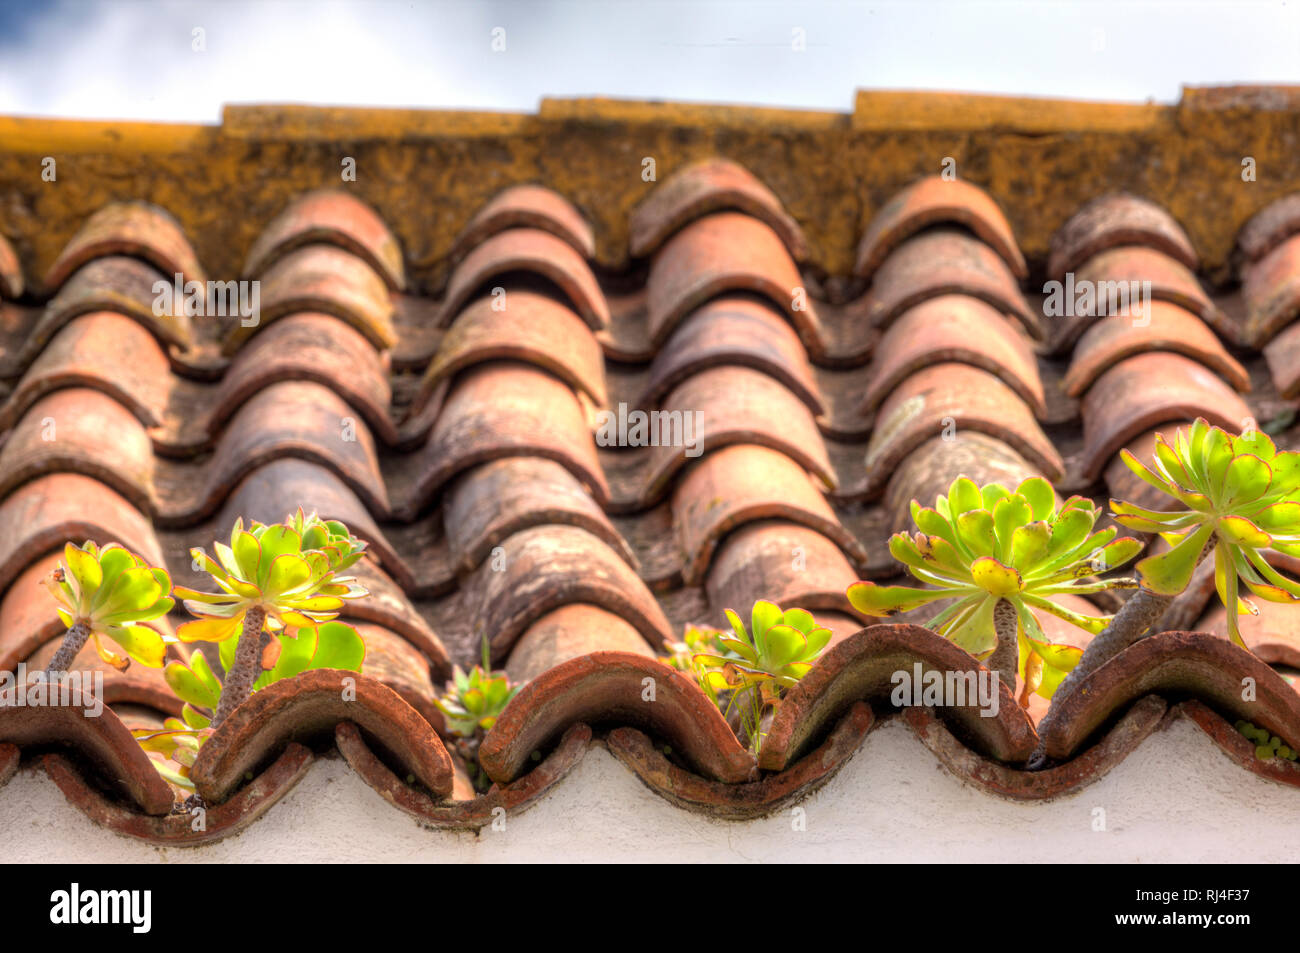 Sukkulenten wachsen auf Hausdach, La Laguna, Teneriffa, Kanarische Inseln, Spanien, - Stock Image